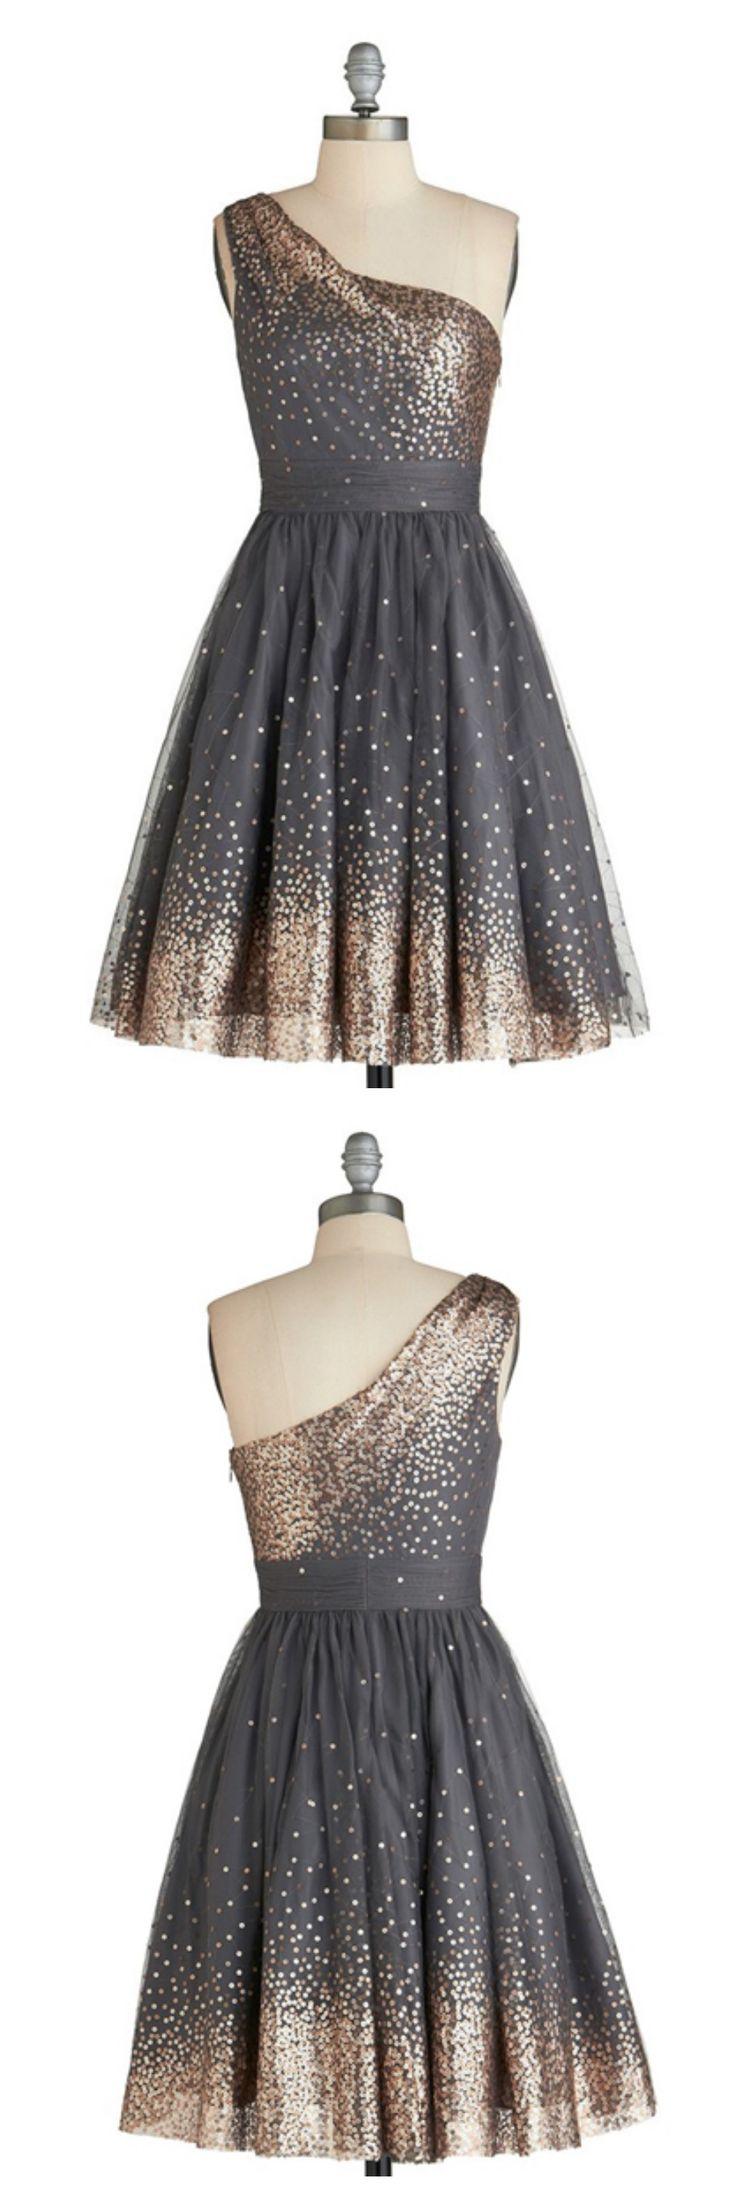 one shoulder homecoming dresses, sequins homecoming dresses,knee length homecoming dresses,prom dresses, cocktail dresses #SIMIBridal #homecomingdresses